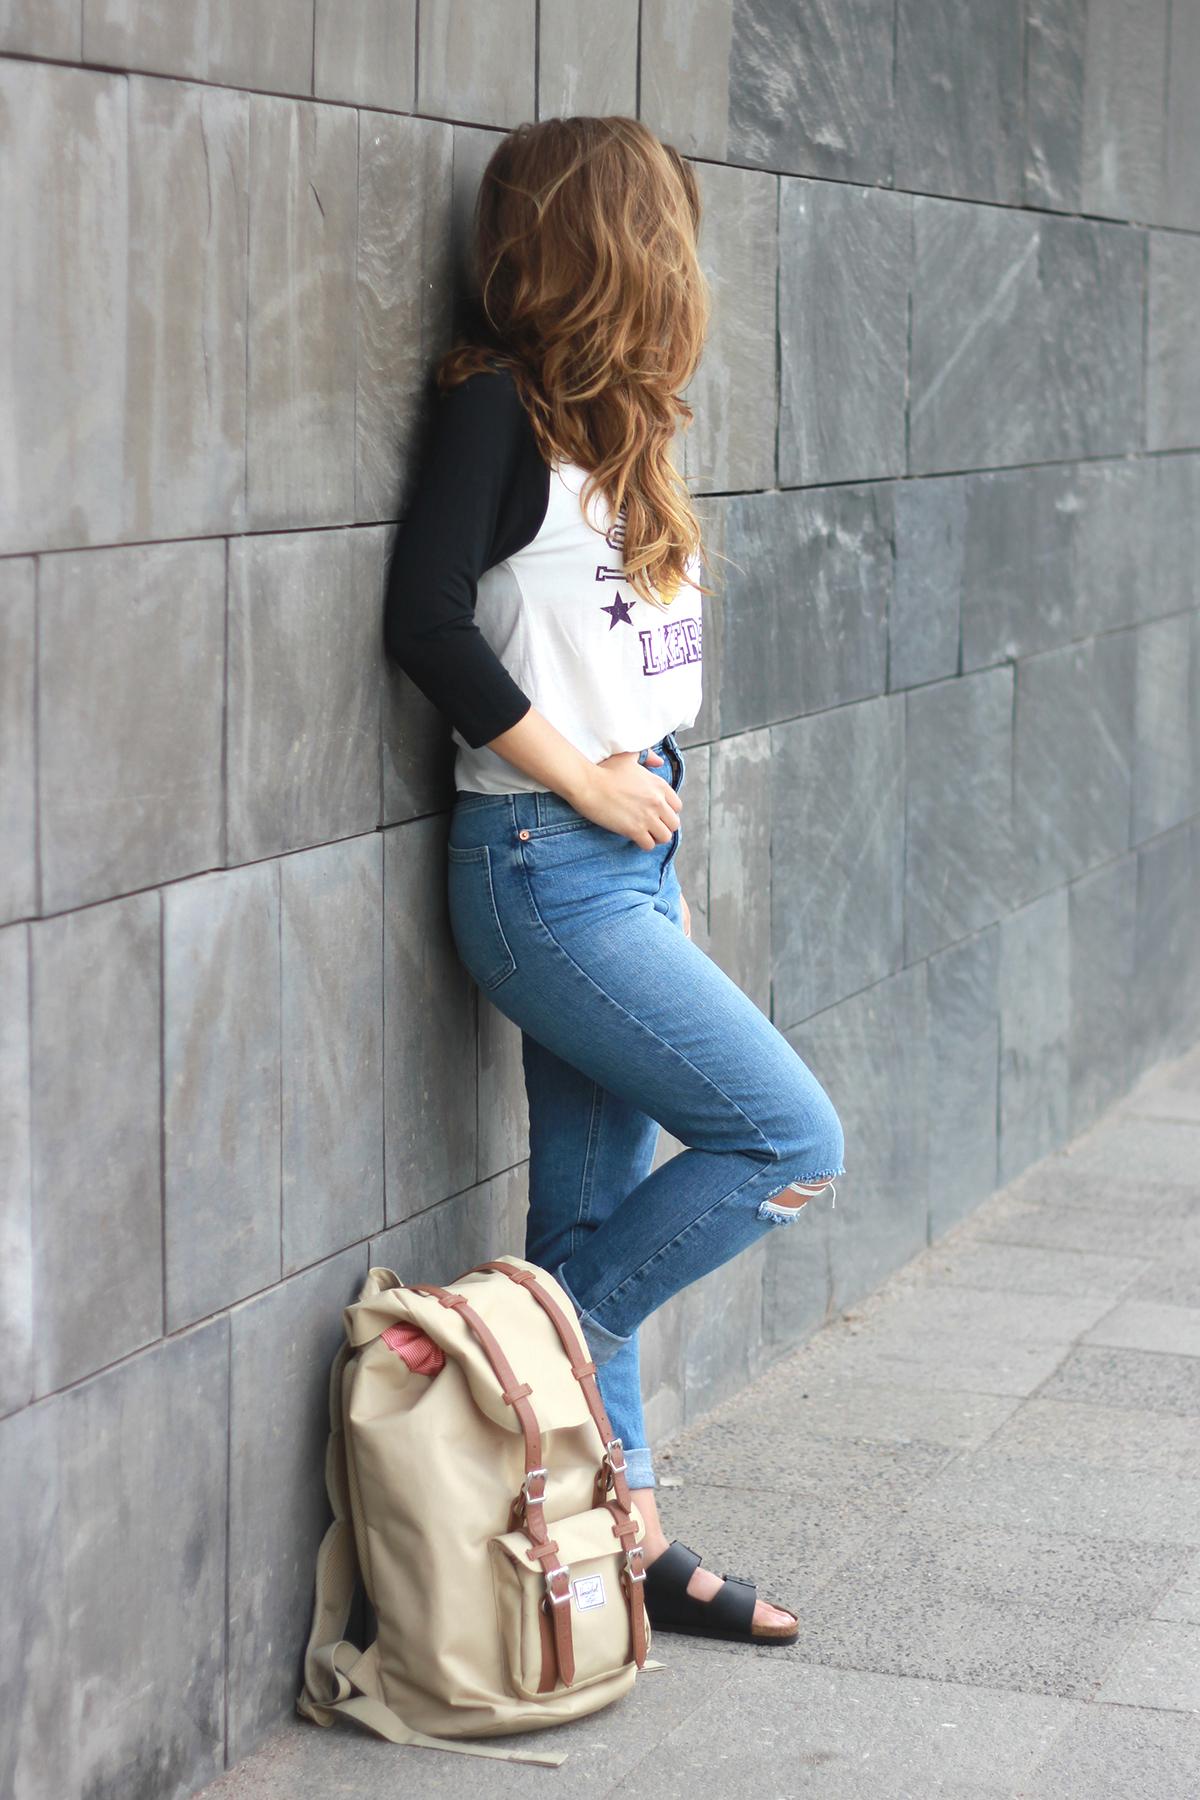 lakers shirt-mom jeans-herschel-birkenstock-outfit-fashionblogger